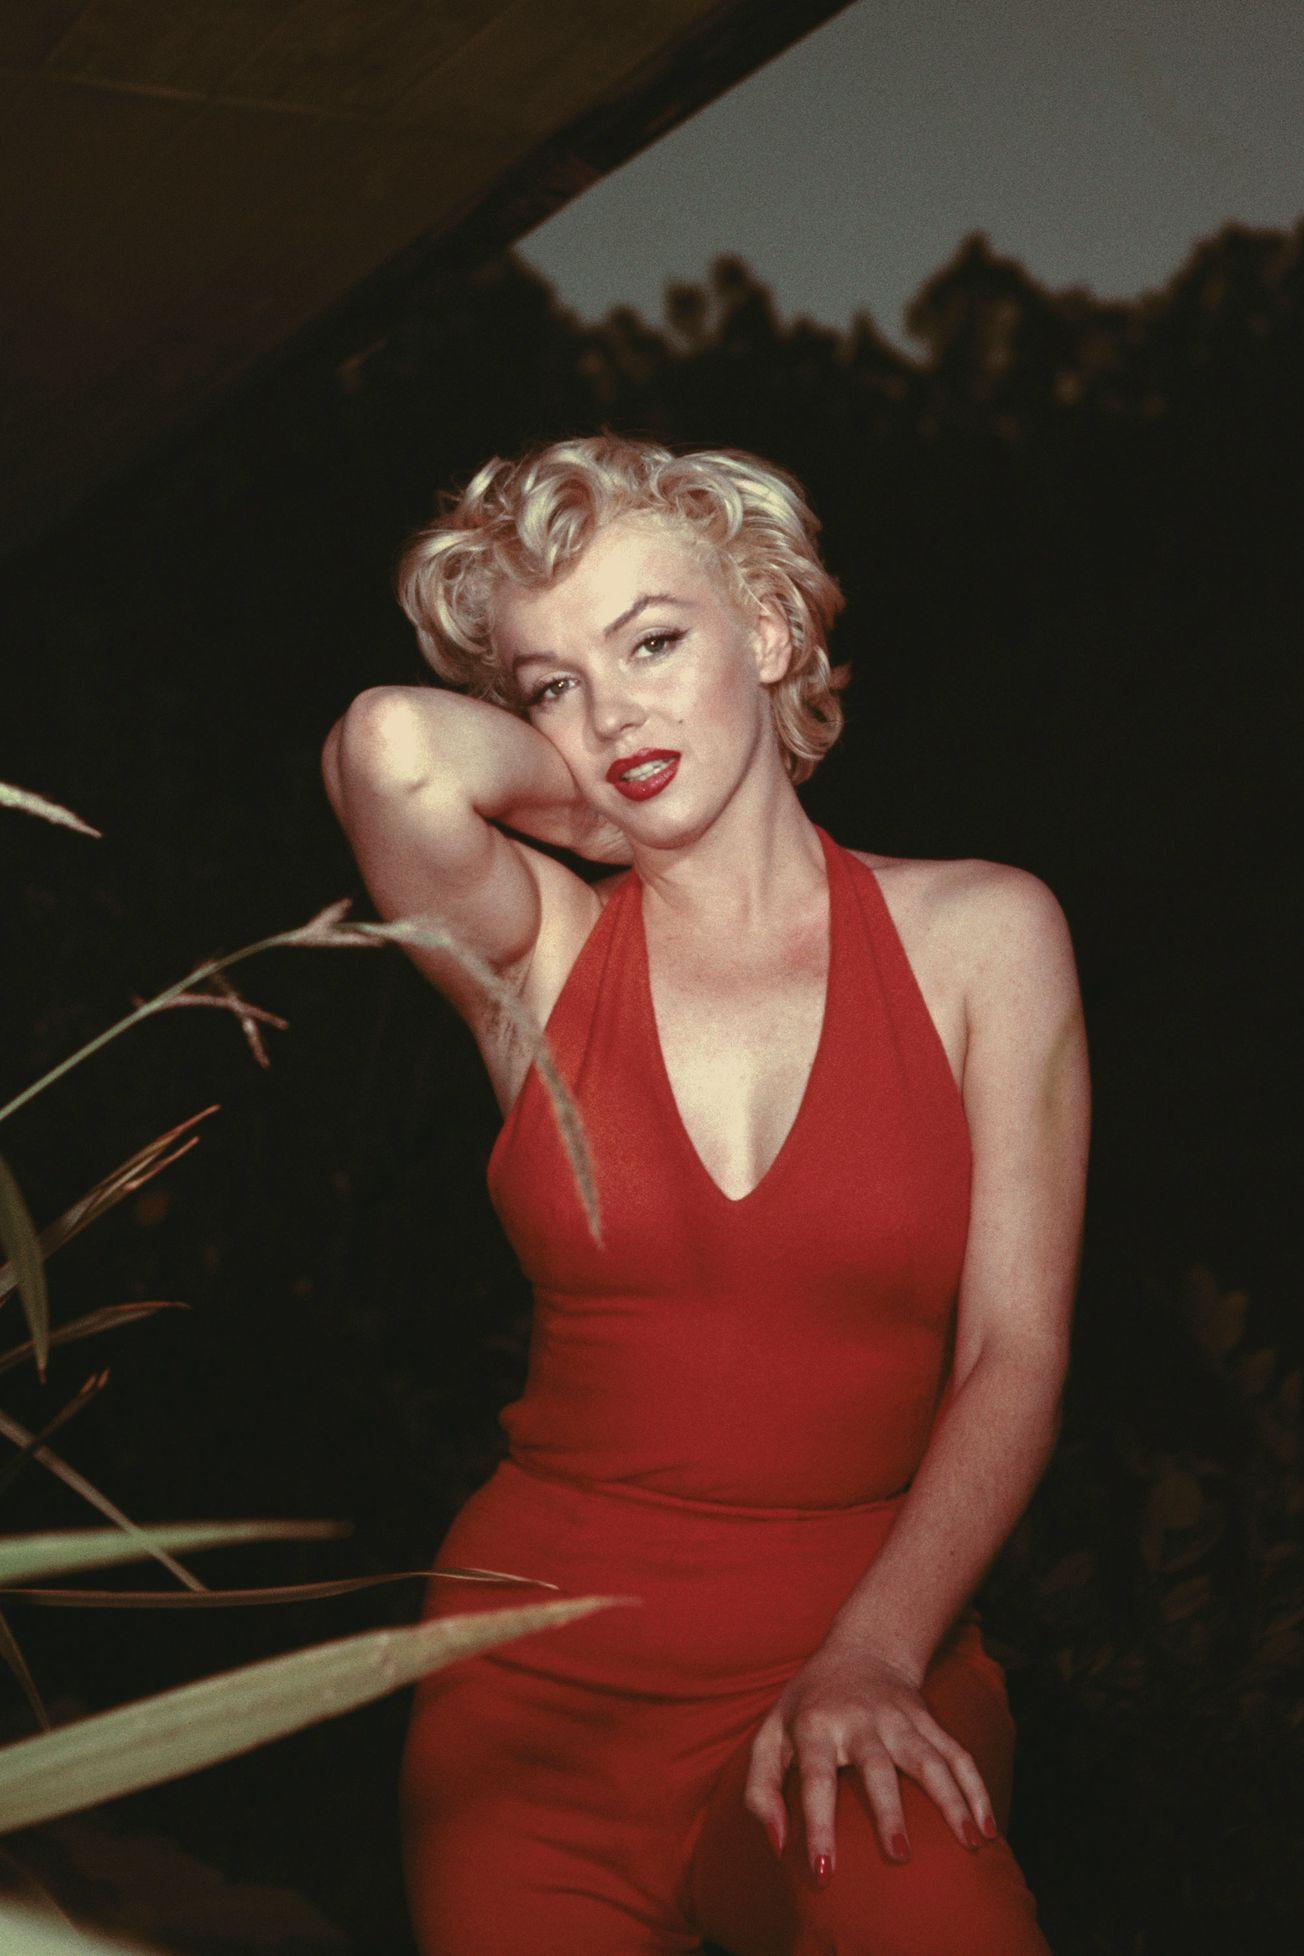 43 Most Glamorous Photos of Marilyn Monroe #hollywoodstars